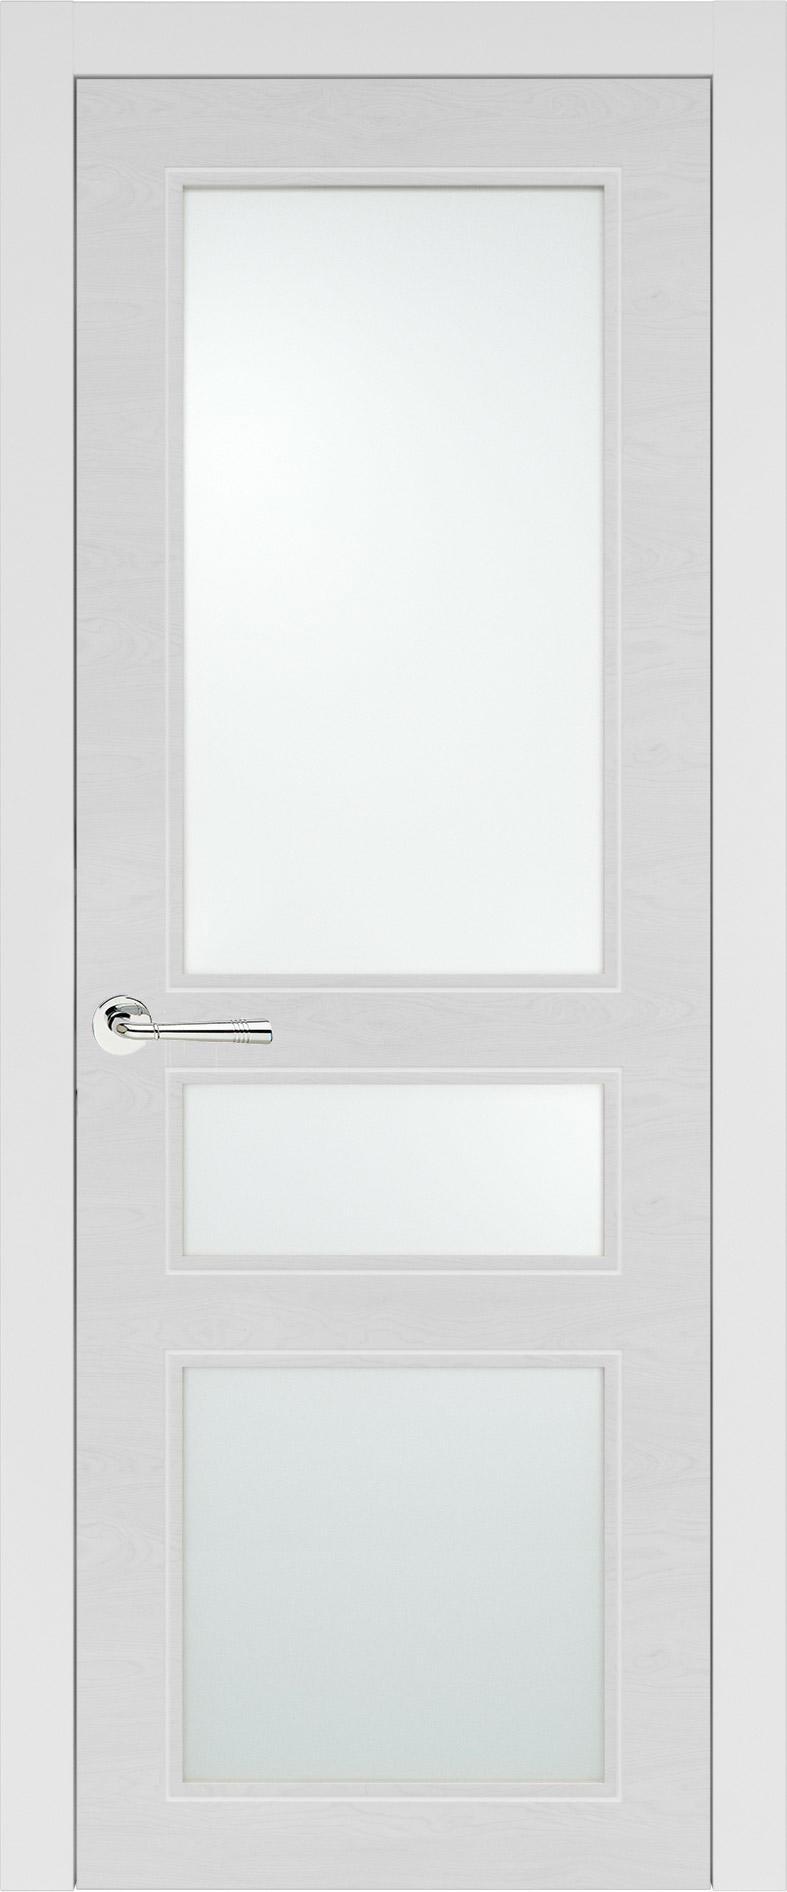 Imperia-R Neo Classic цвет - Белая эмаль по шпону (RAL 9003) Со стеклом (ДО)